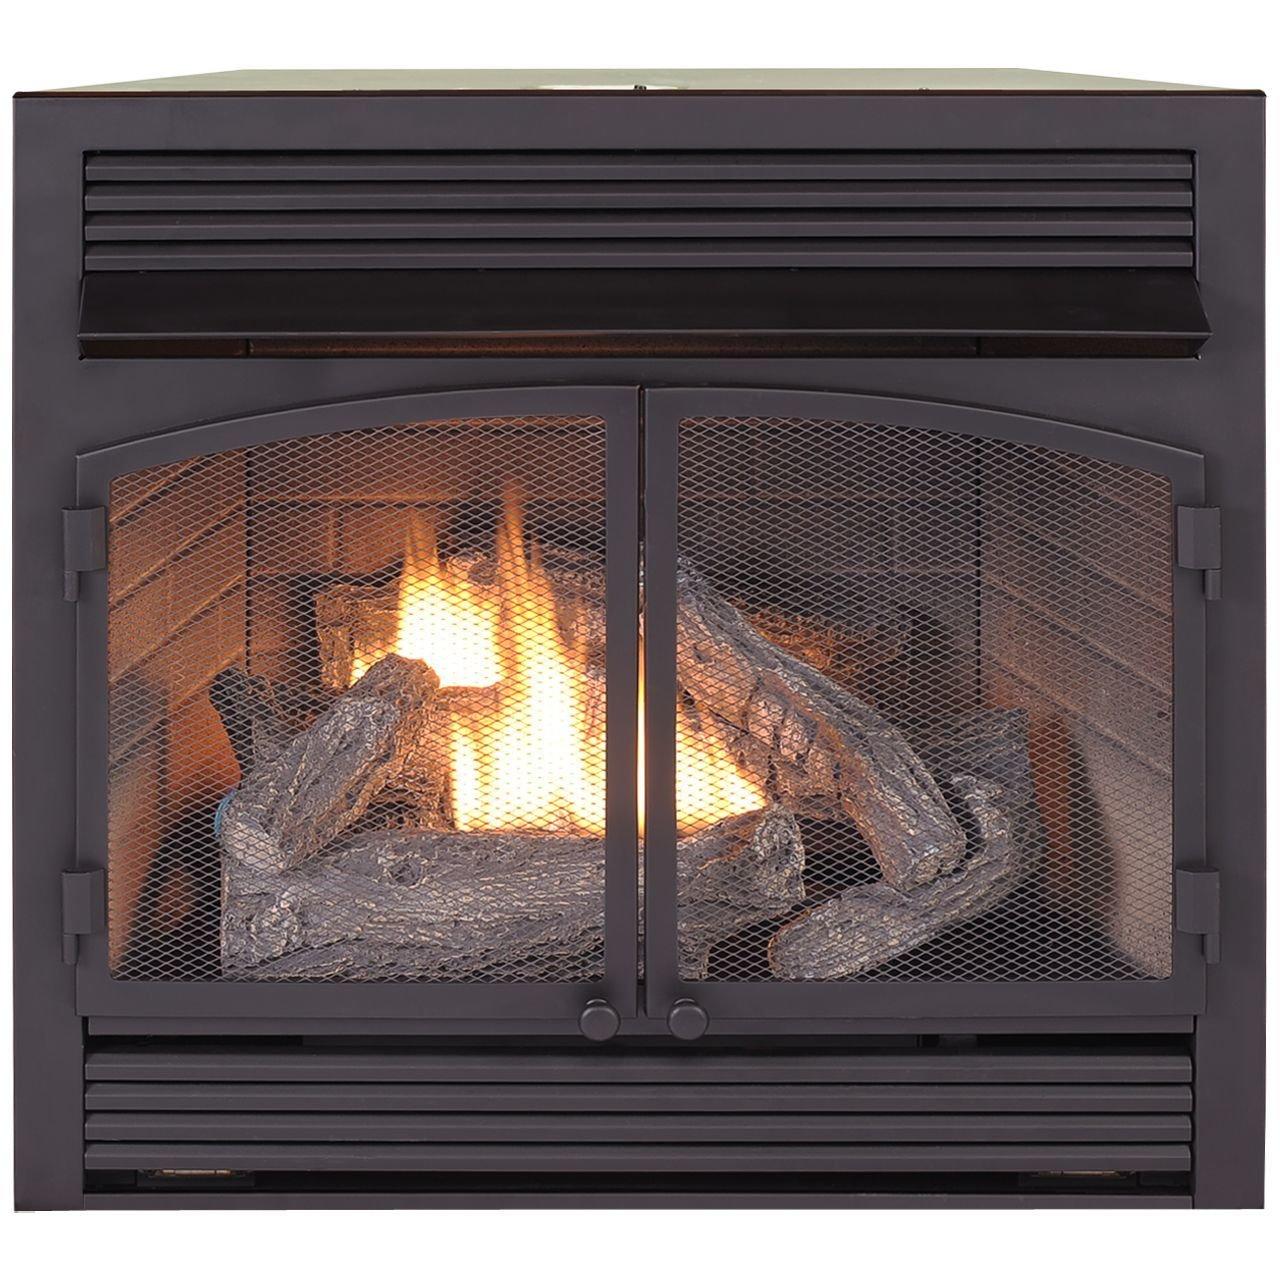 ProCom FBNSD400T-ZC Dual Fuel Ventless Gas Fireplace Insert, 29.5'' H x 29.1'' W x 15.6'' D, Black by ProCom